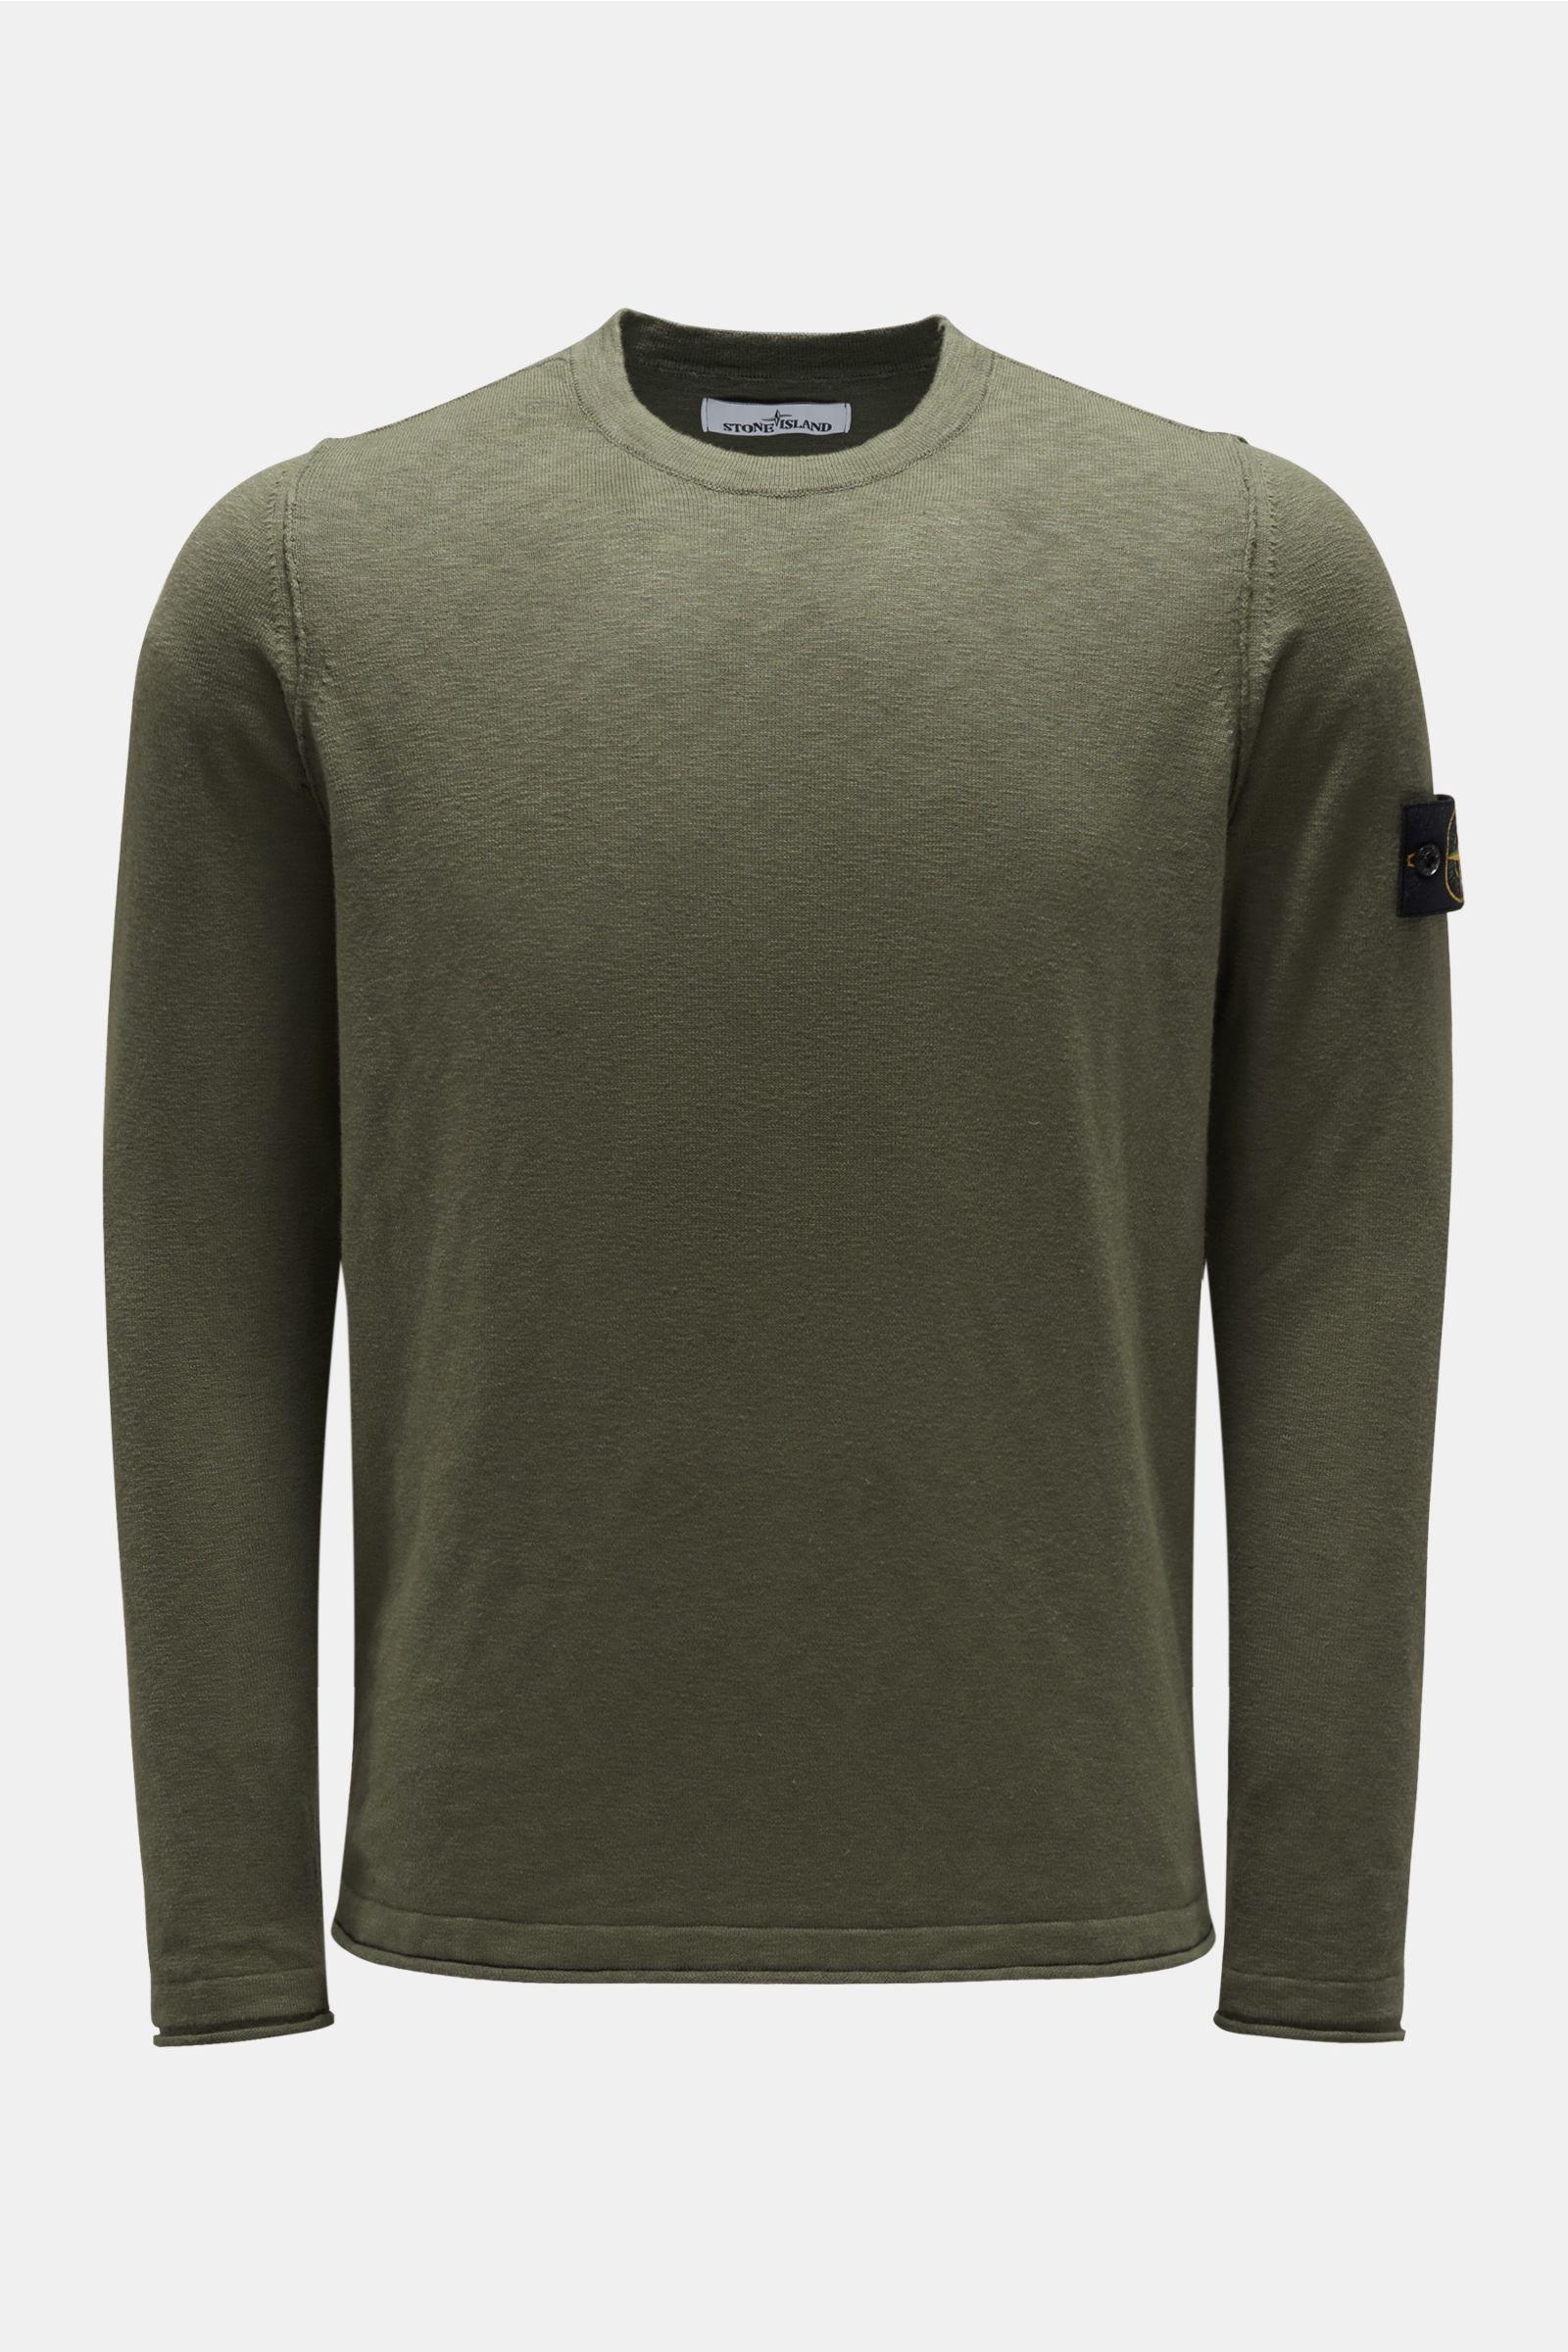 Crew neck jumper grey-green